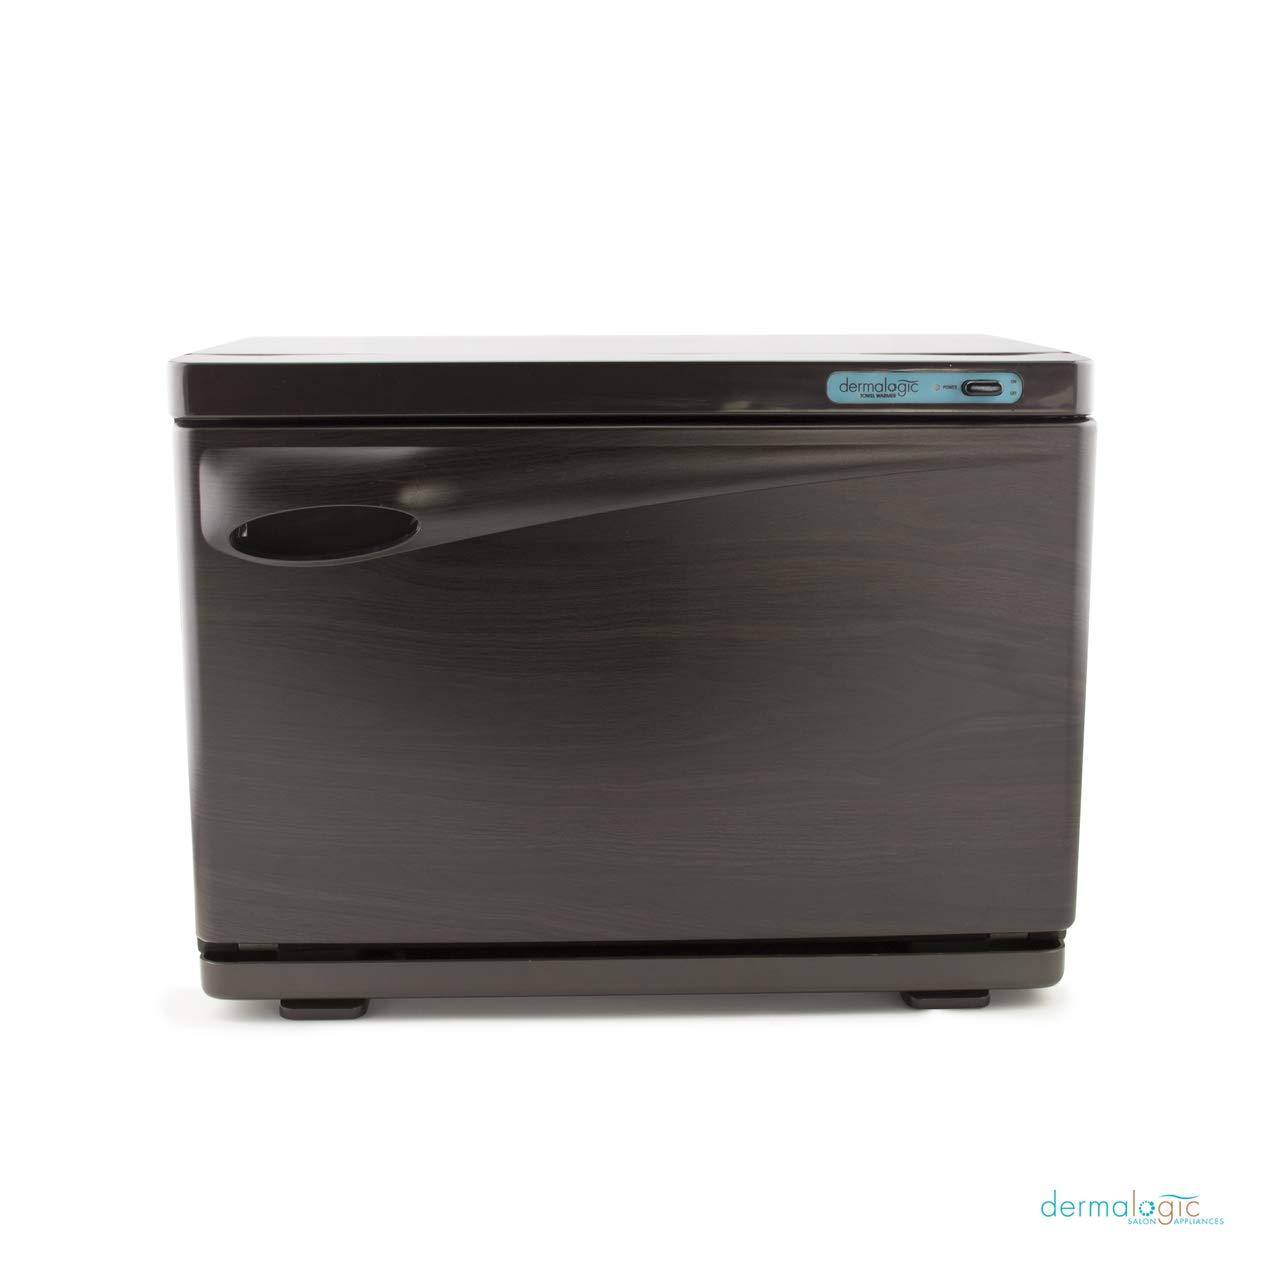 Towel Warming Equipment Wood Grain Towel Warmer with UV Sterilizer 20L HOT SALE! Small Warmer Best Seller Keeps Towel Crisp and Warm